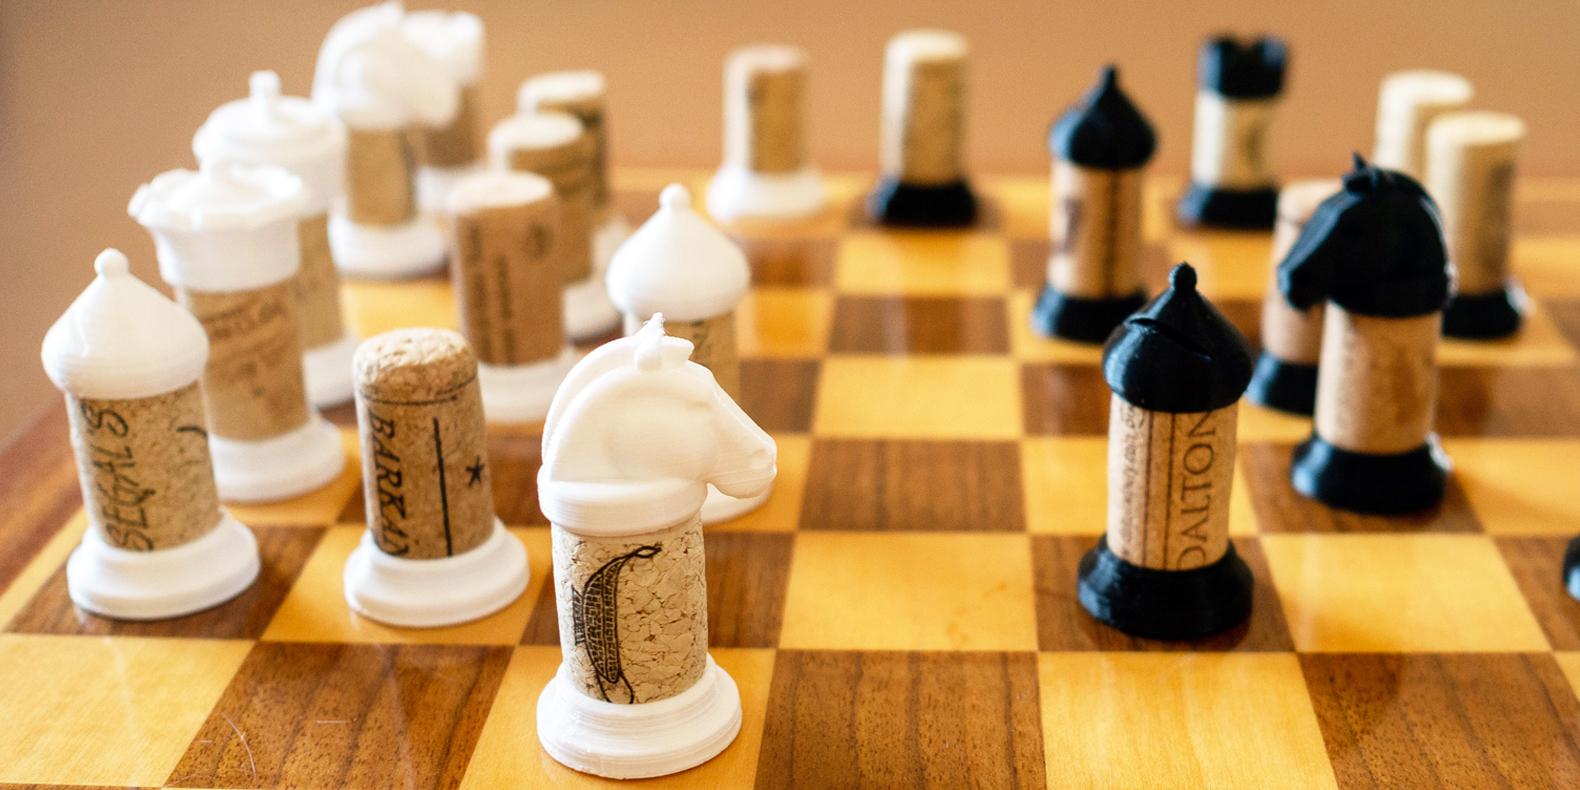 3d print upcycled wine cork chess set